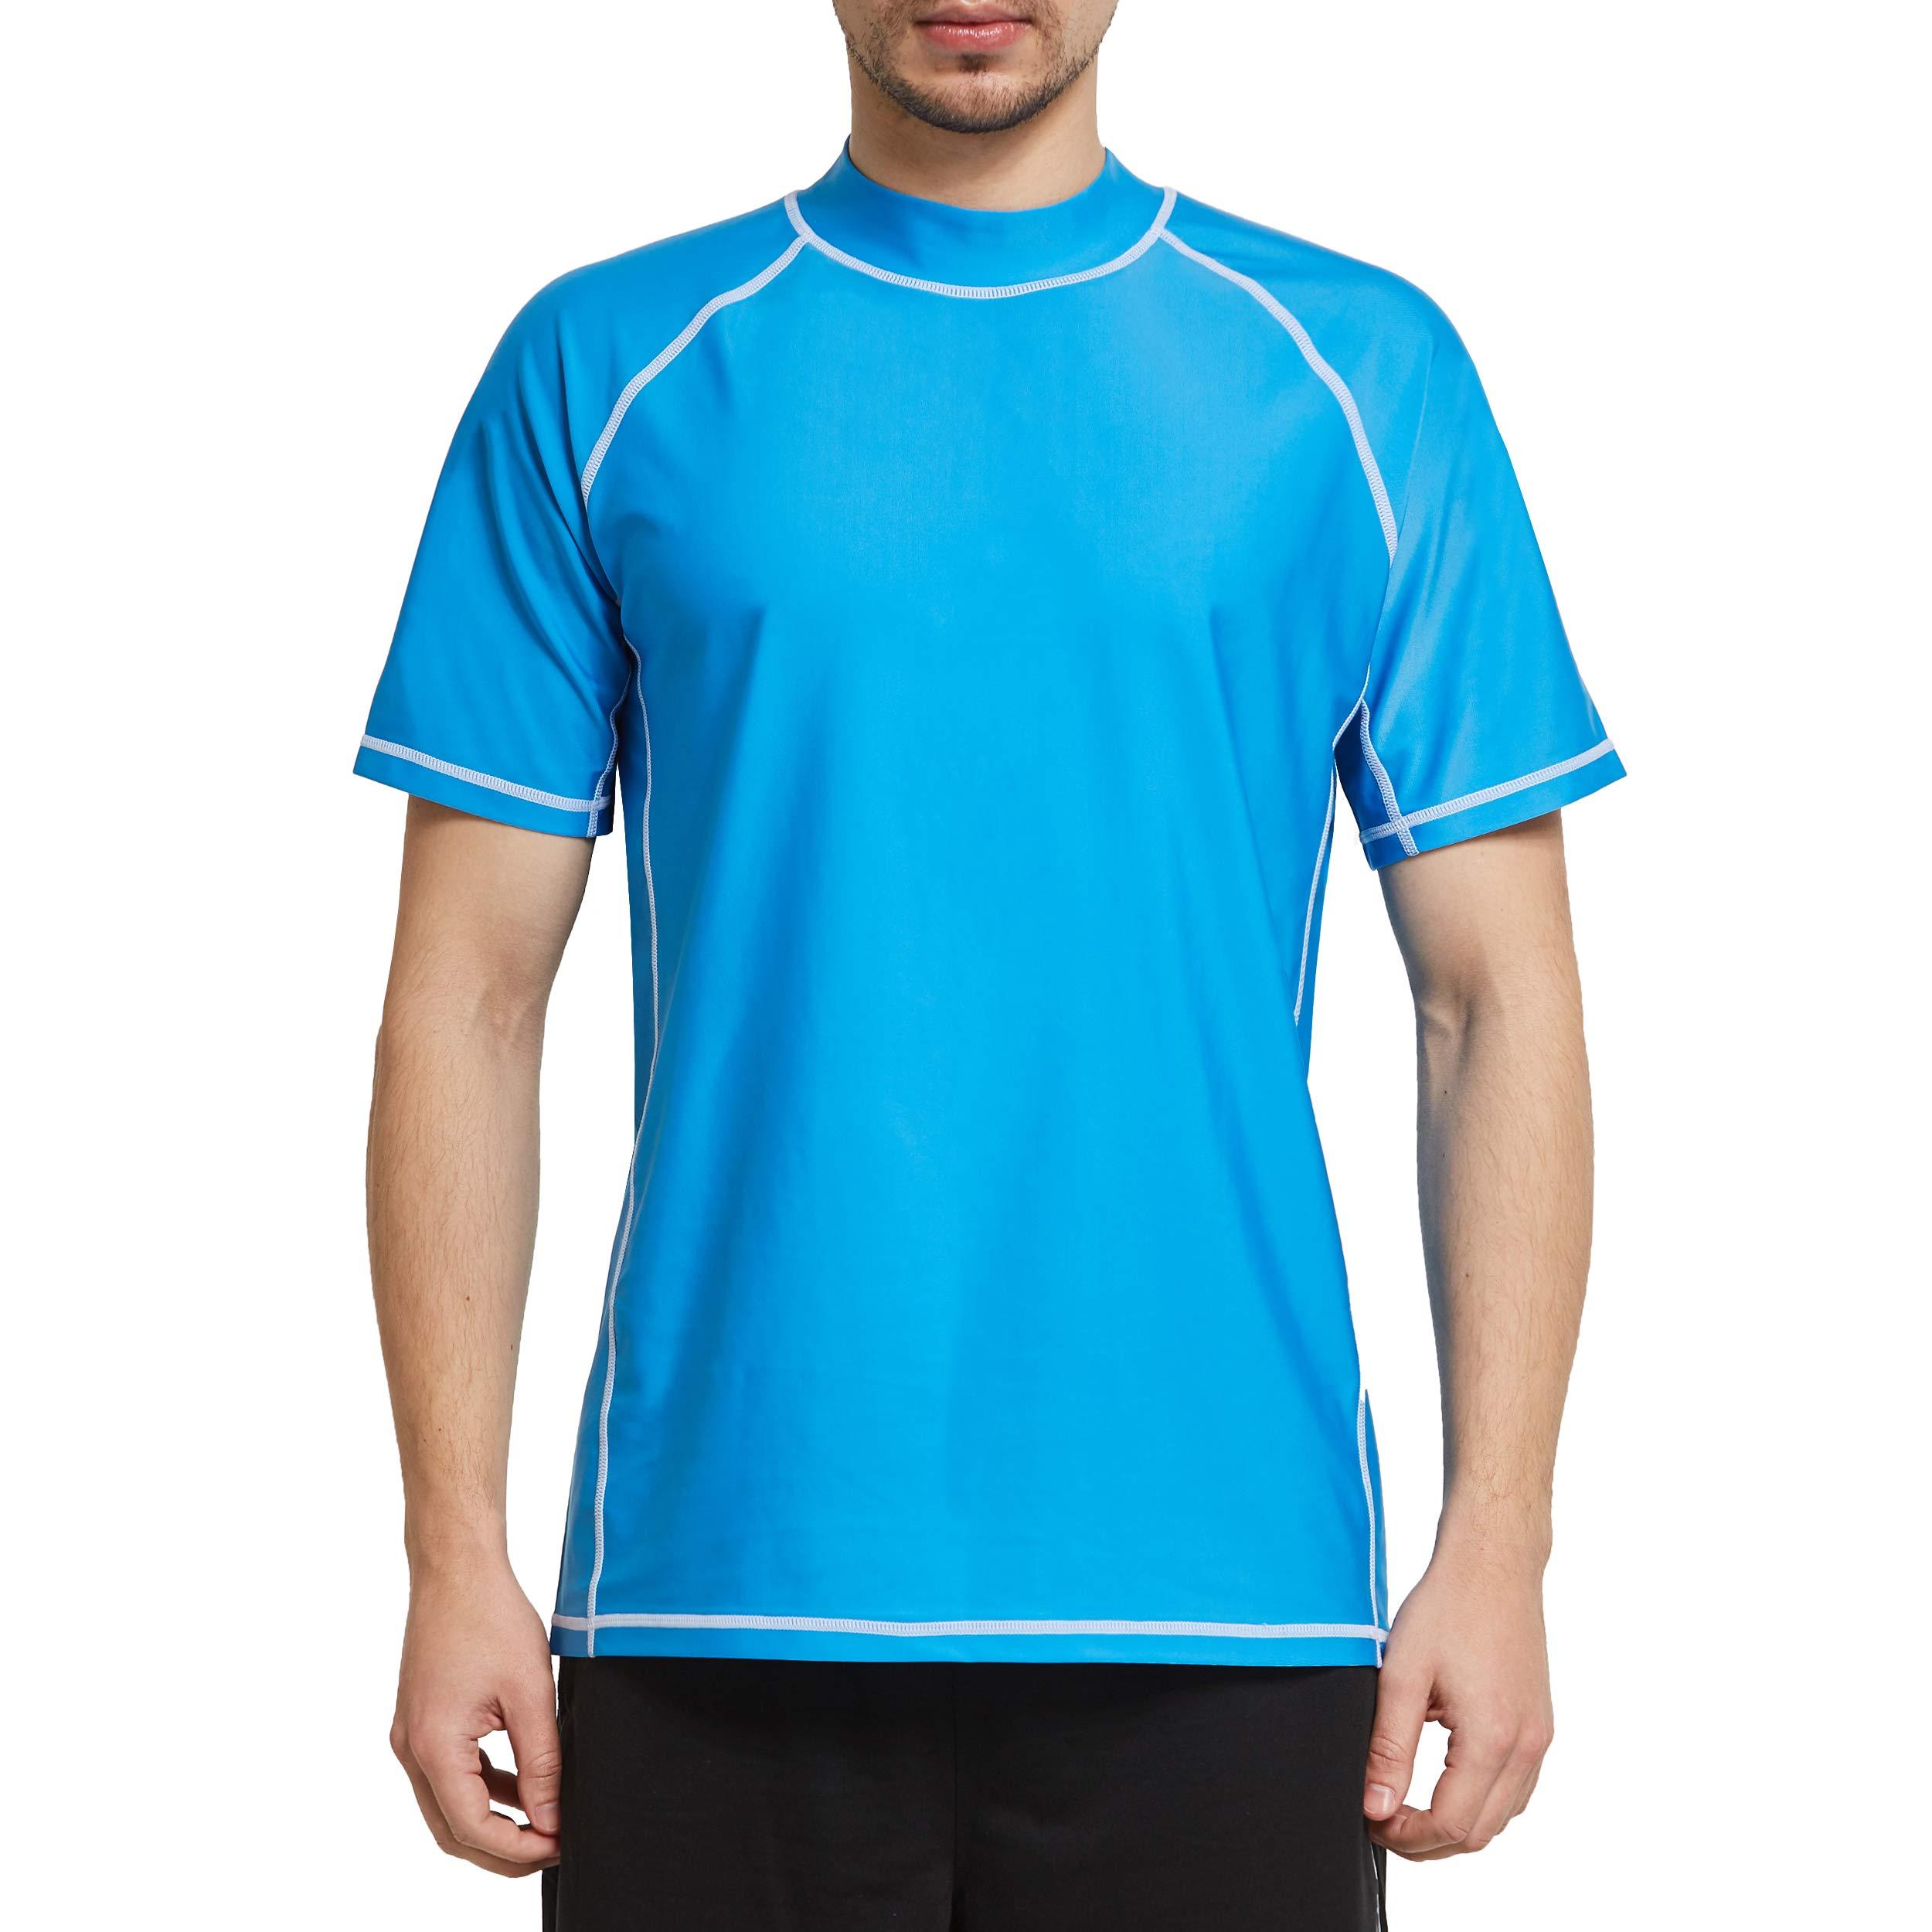 Ogeenier Mens Rash Vest Short Sleeve Rash Guard Top Swim Diving UV Protection UPF 50 Shirts